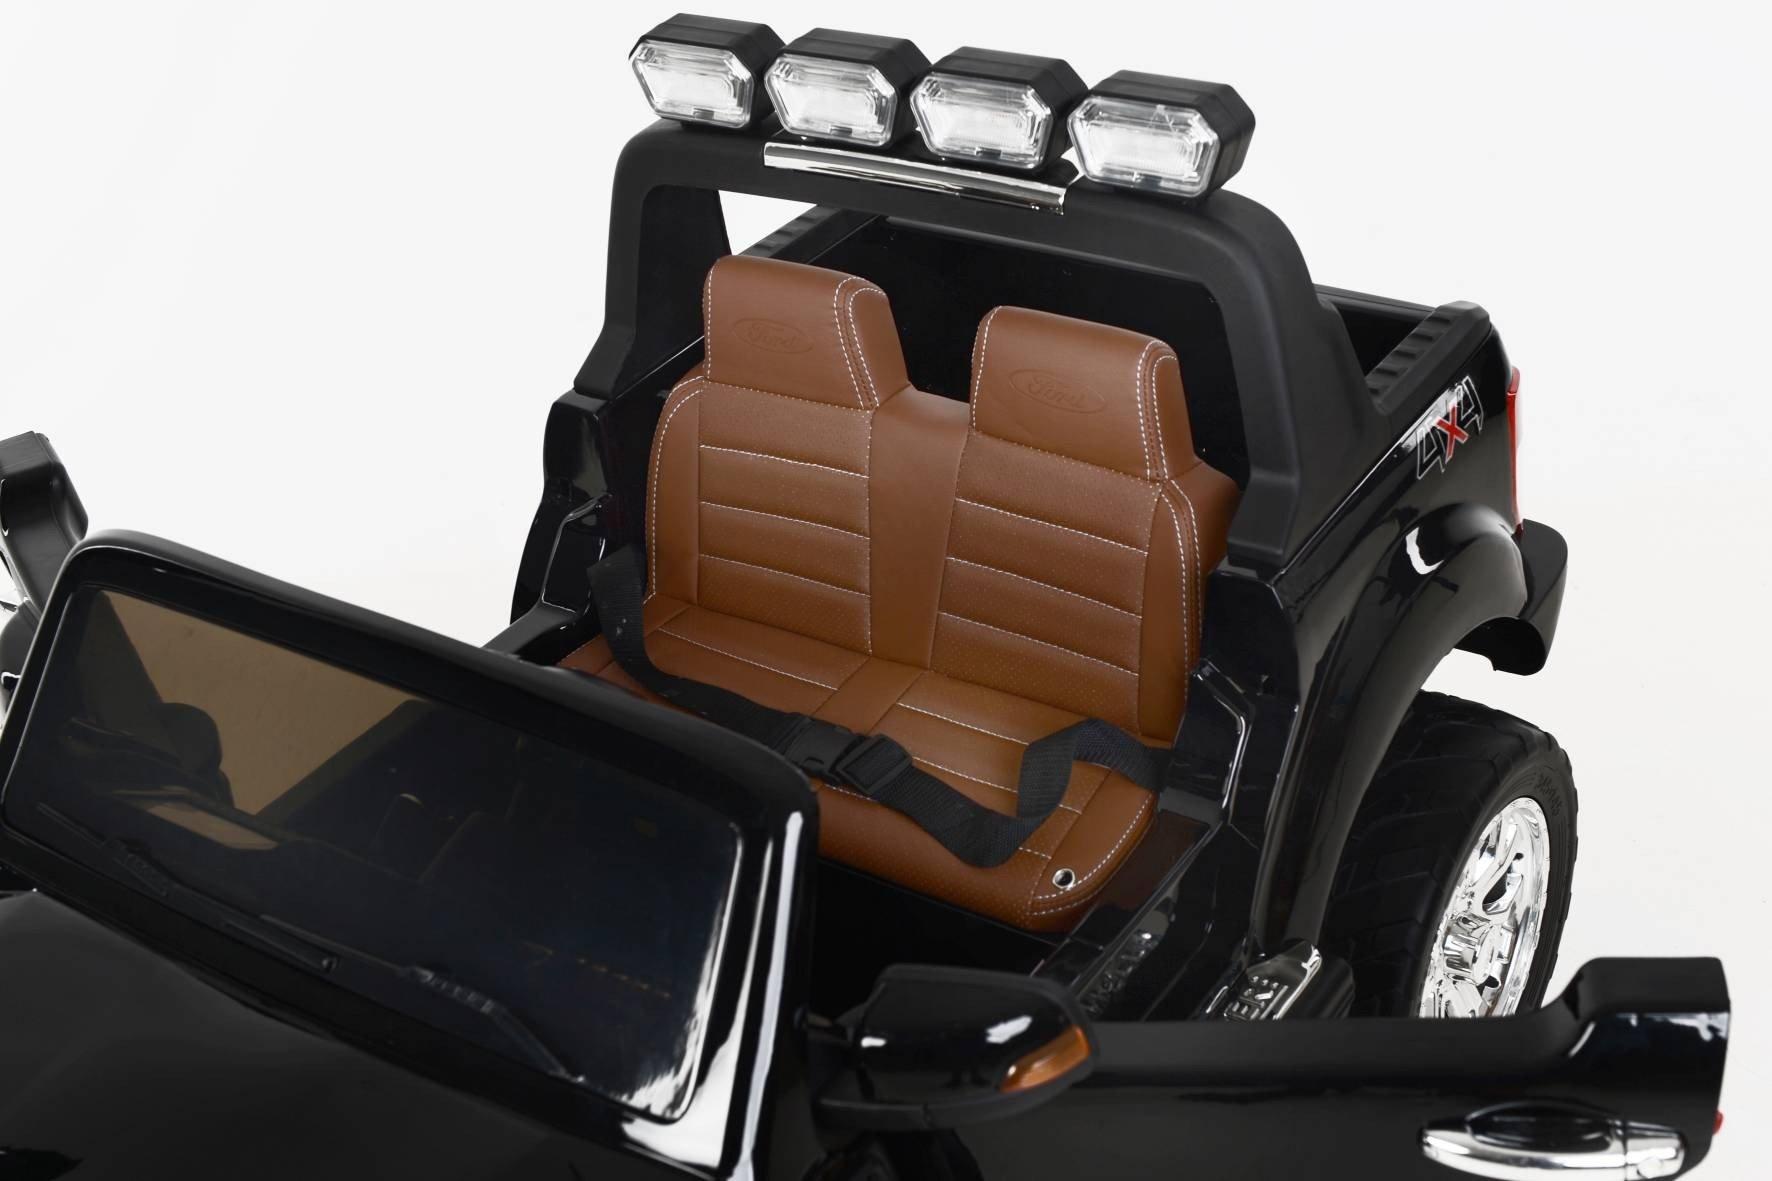 Todoterreno electrico para niños Ford Ranger MP4 Negro Metalizado asiento acolchado